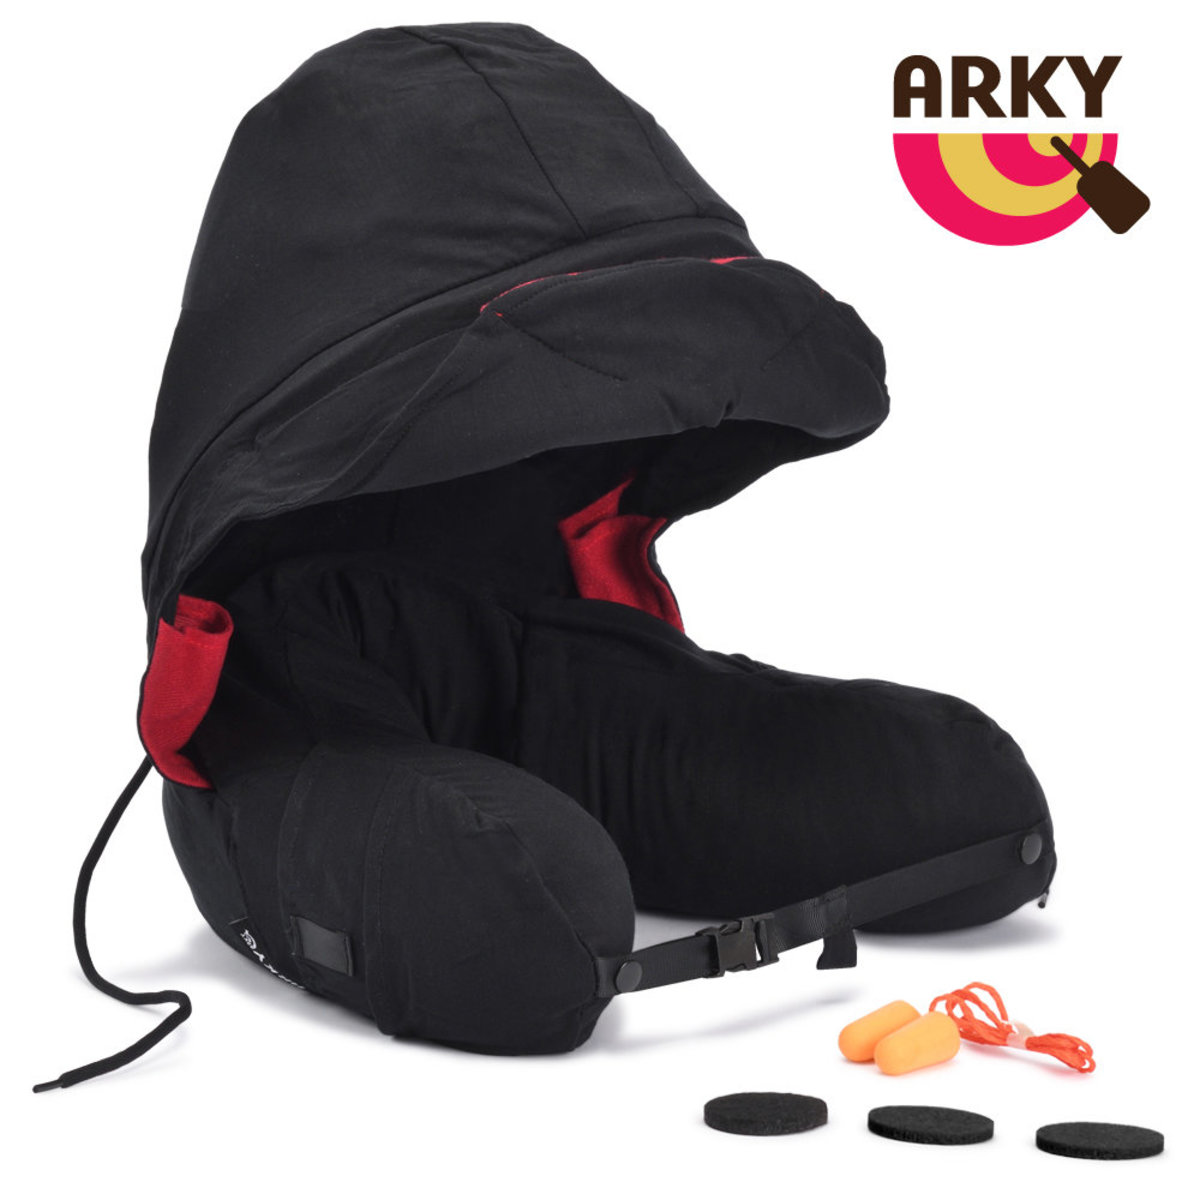 ARKY Somnus Travel Pillow 咕咕旅行枕-乳膠顆粒版-紐西蘭黑